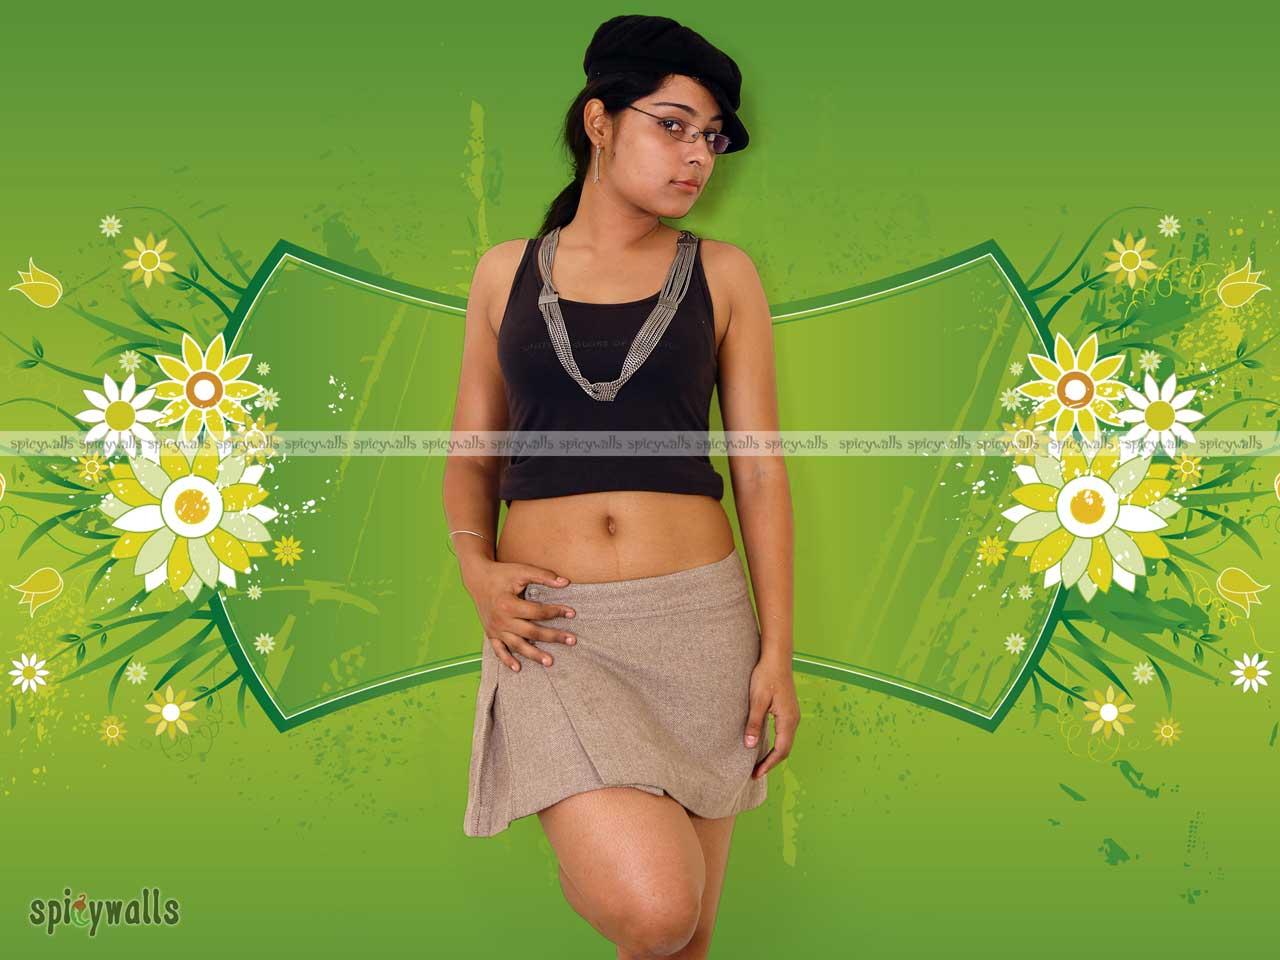 anshu telugu actress